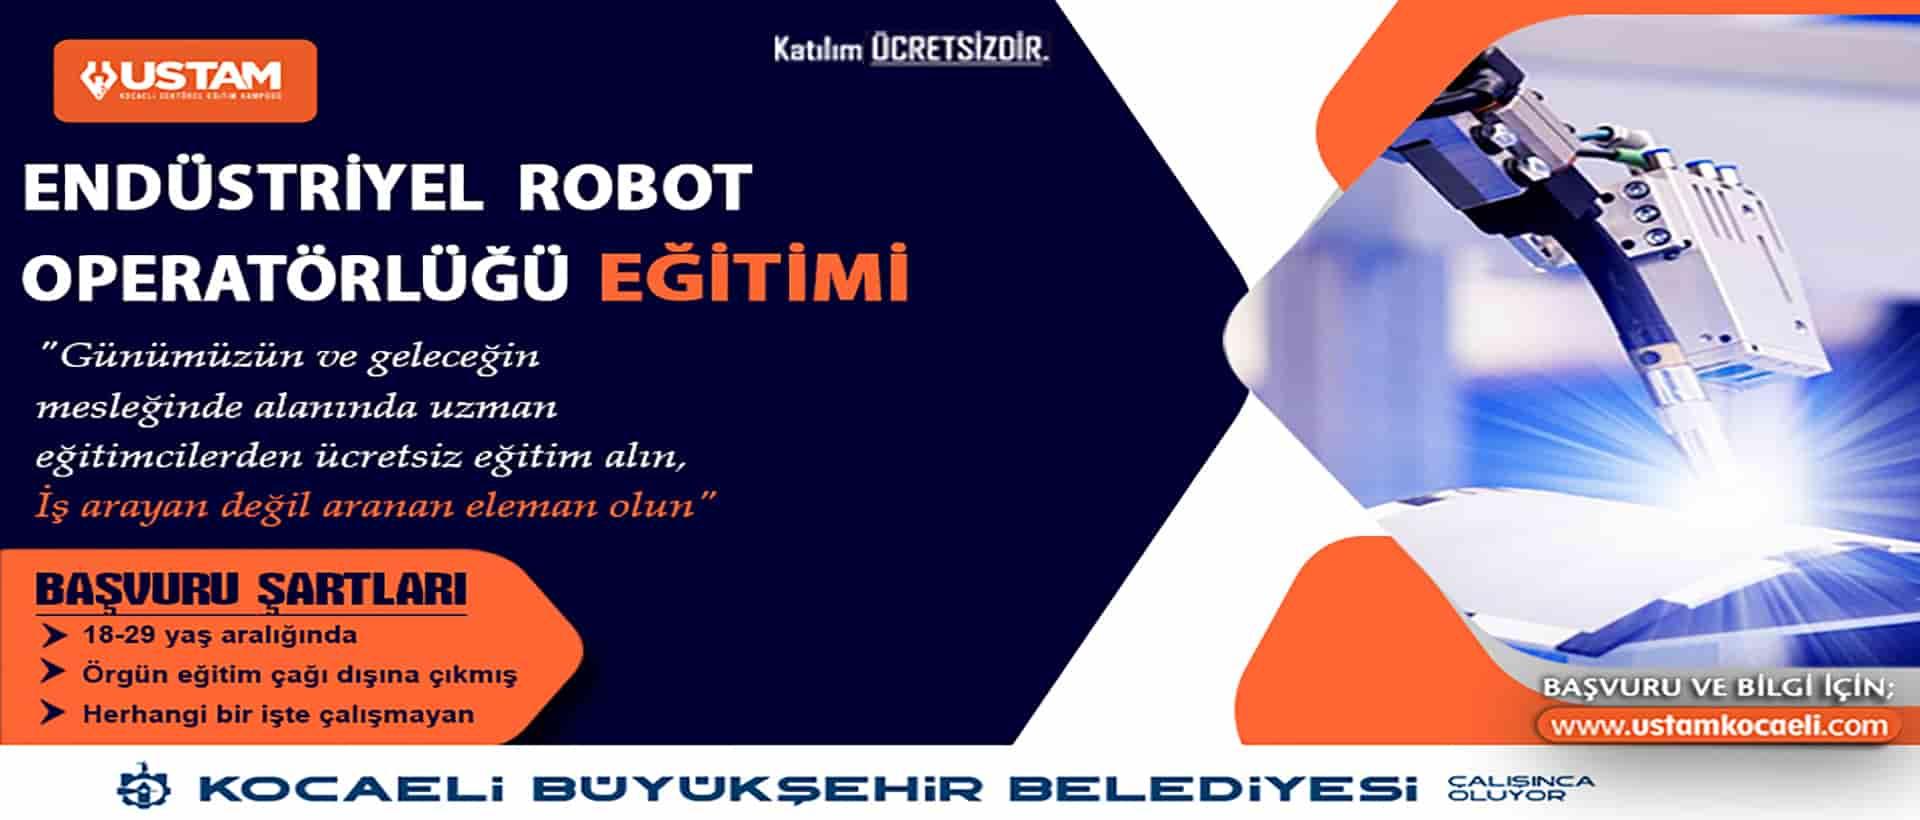 Ustam robot